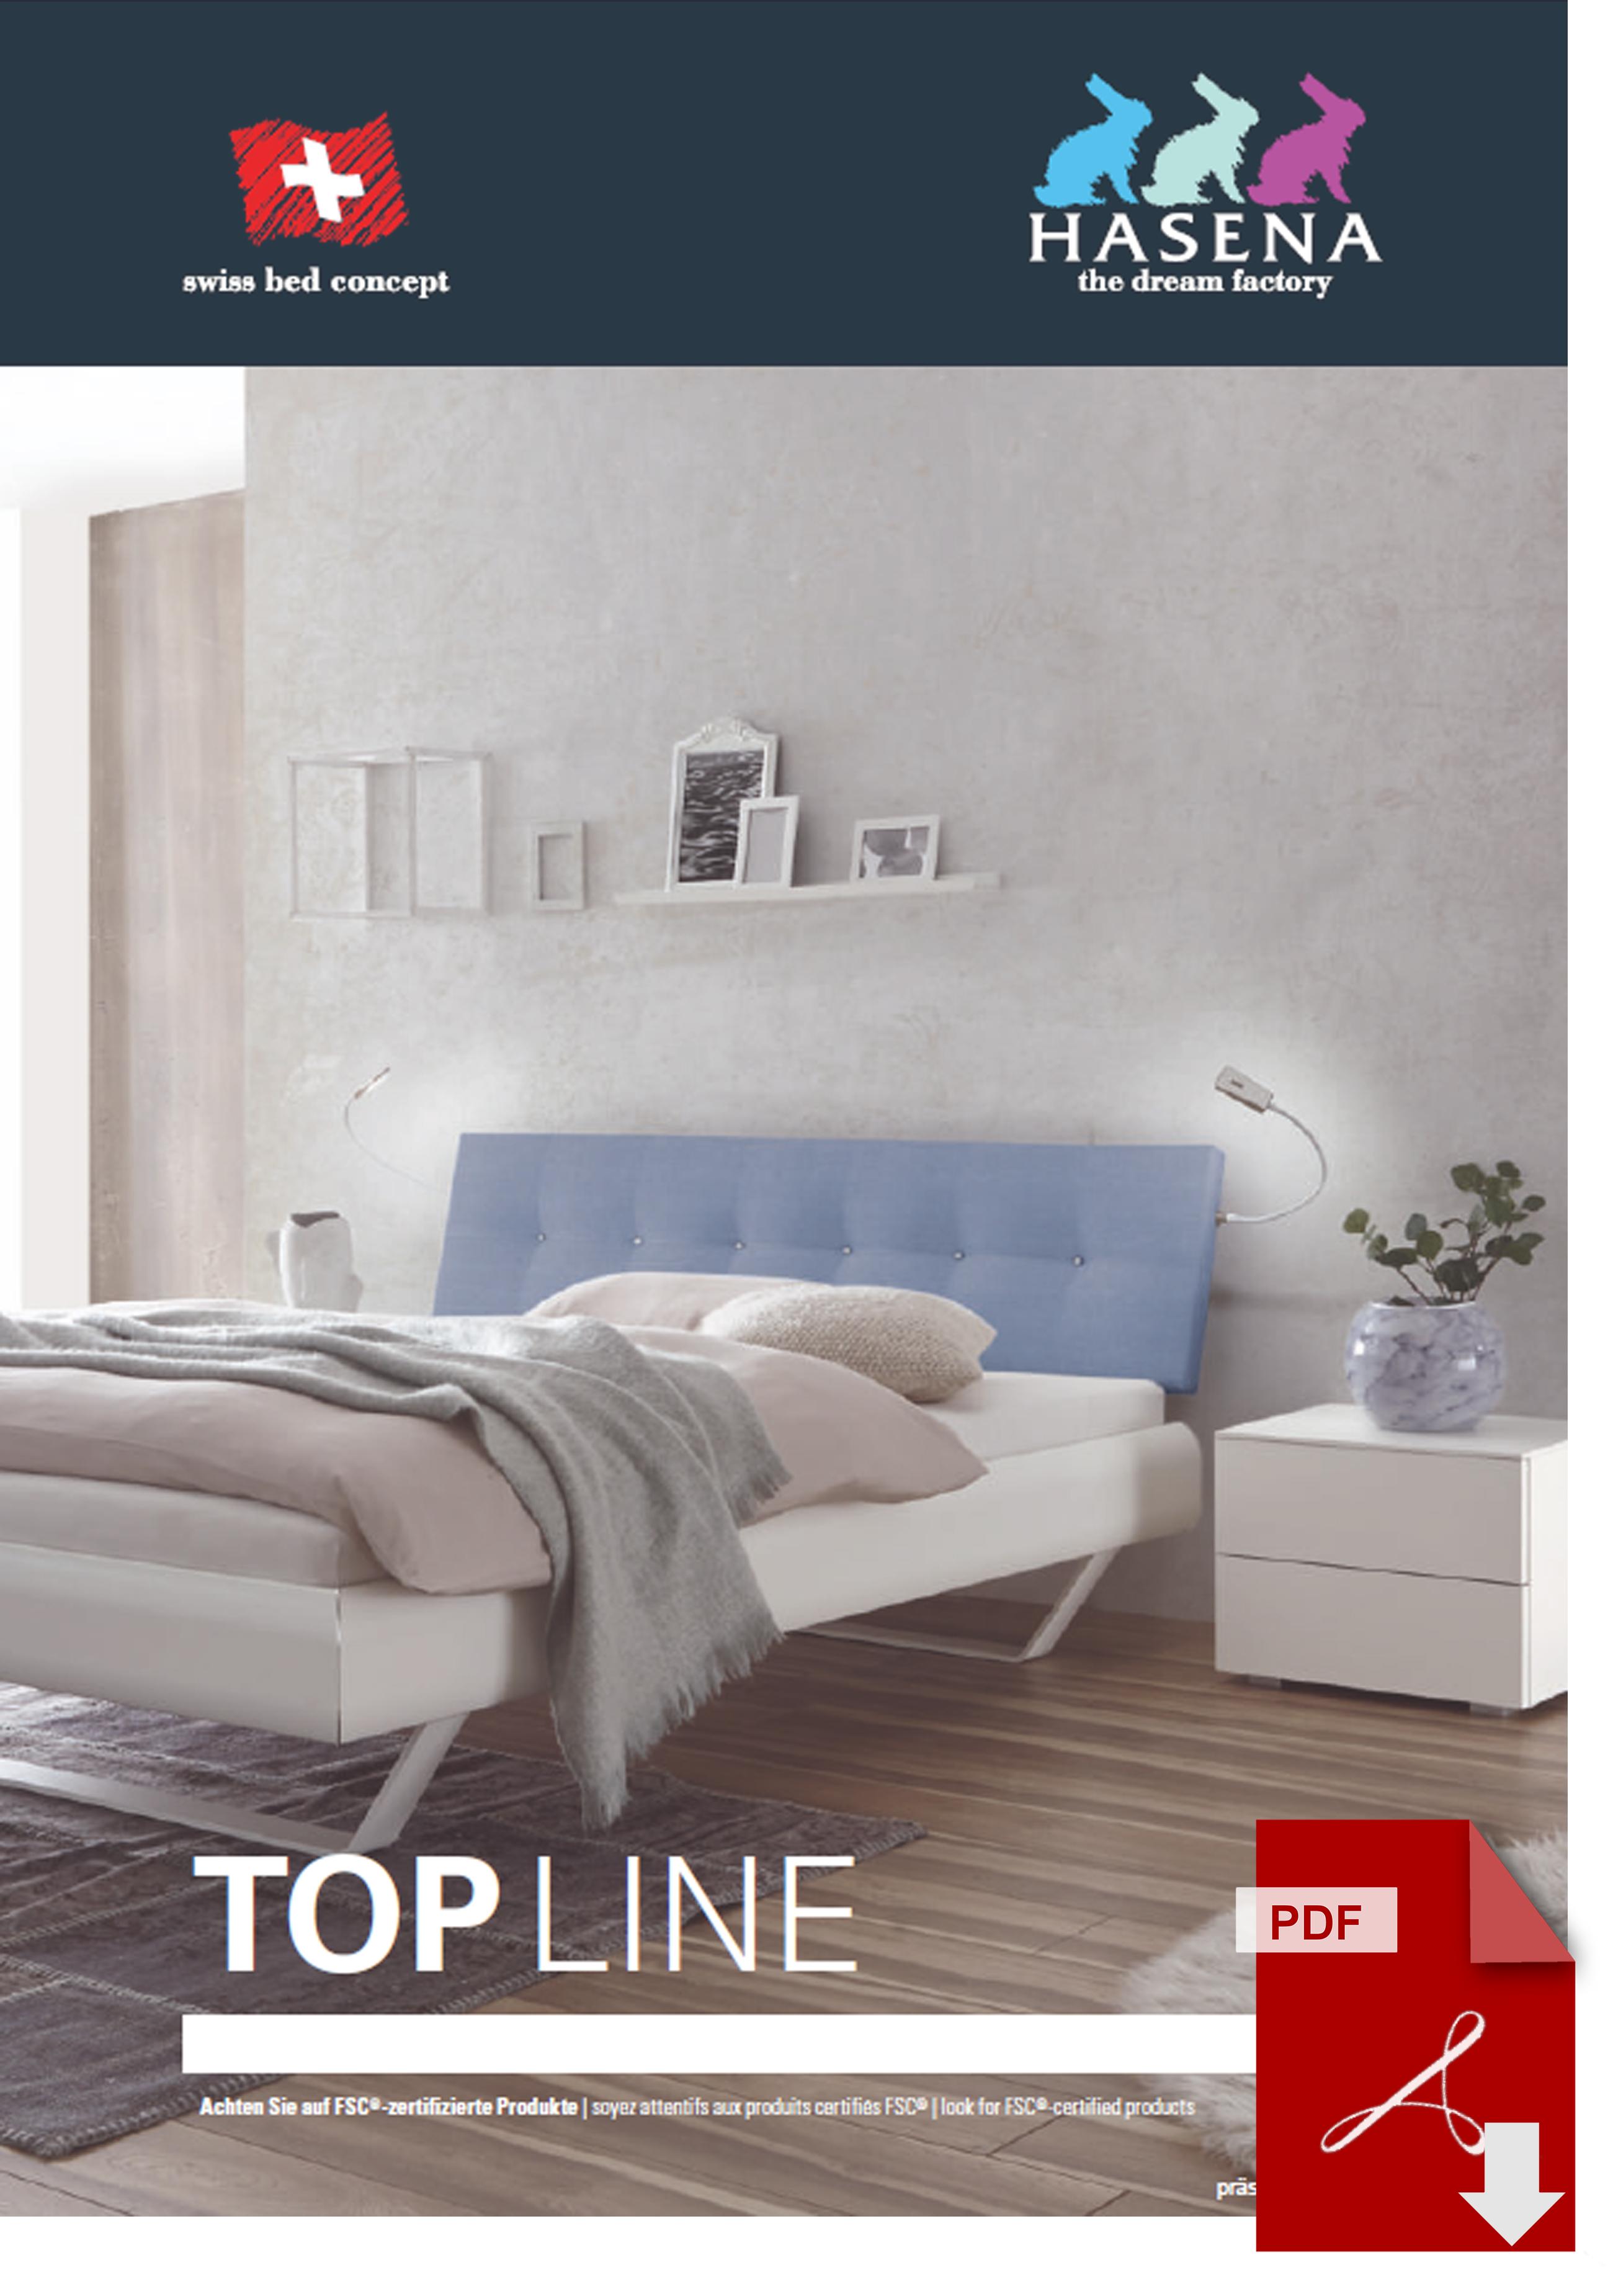 Hasena Top Line Katalog als PDF Datei